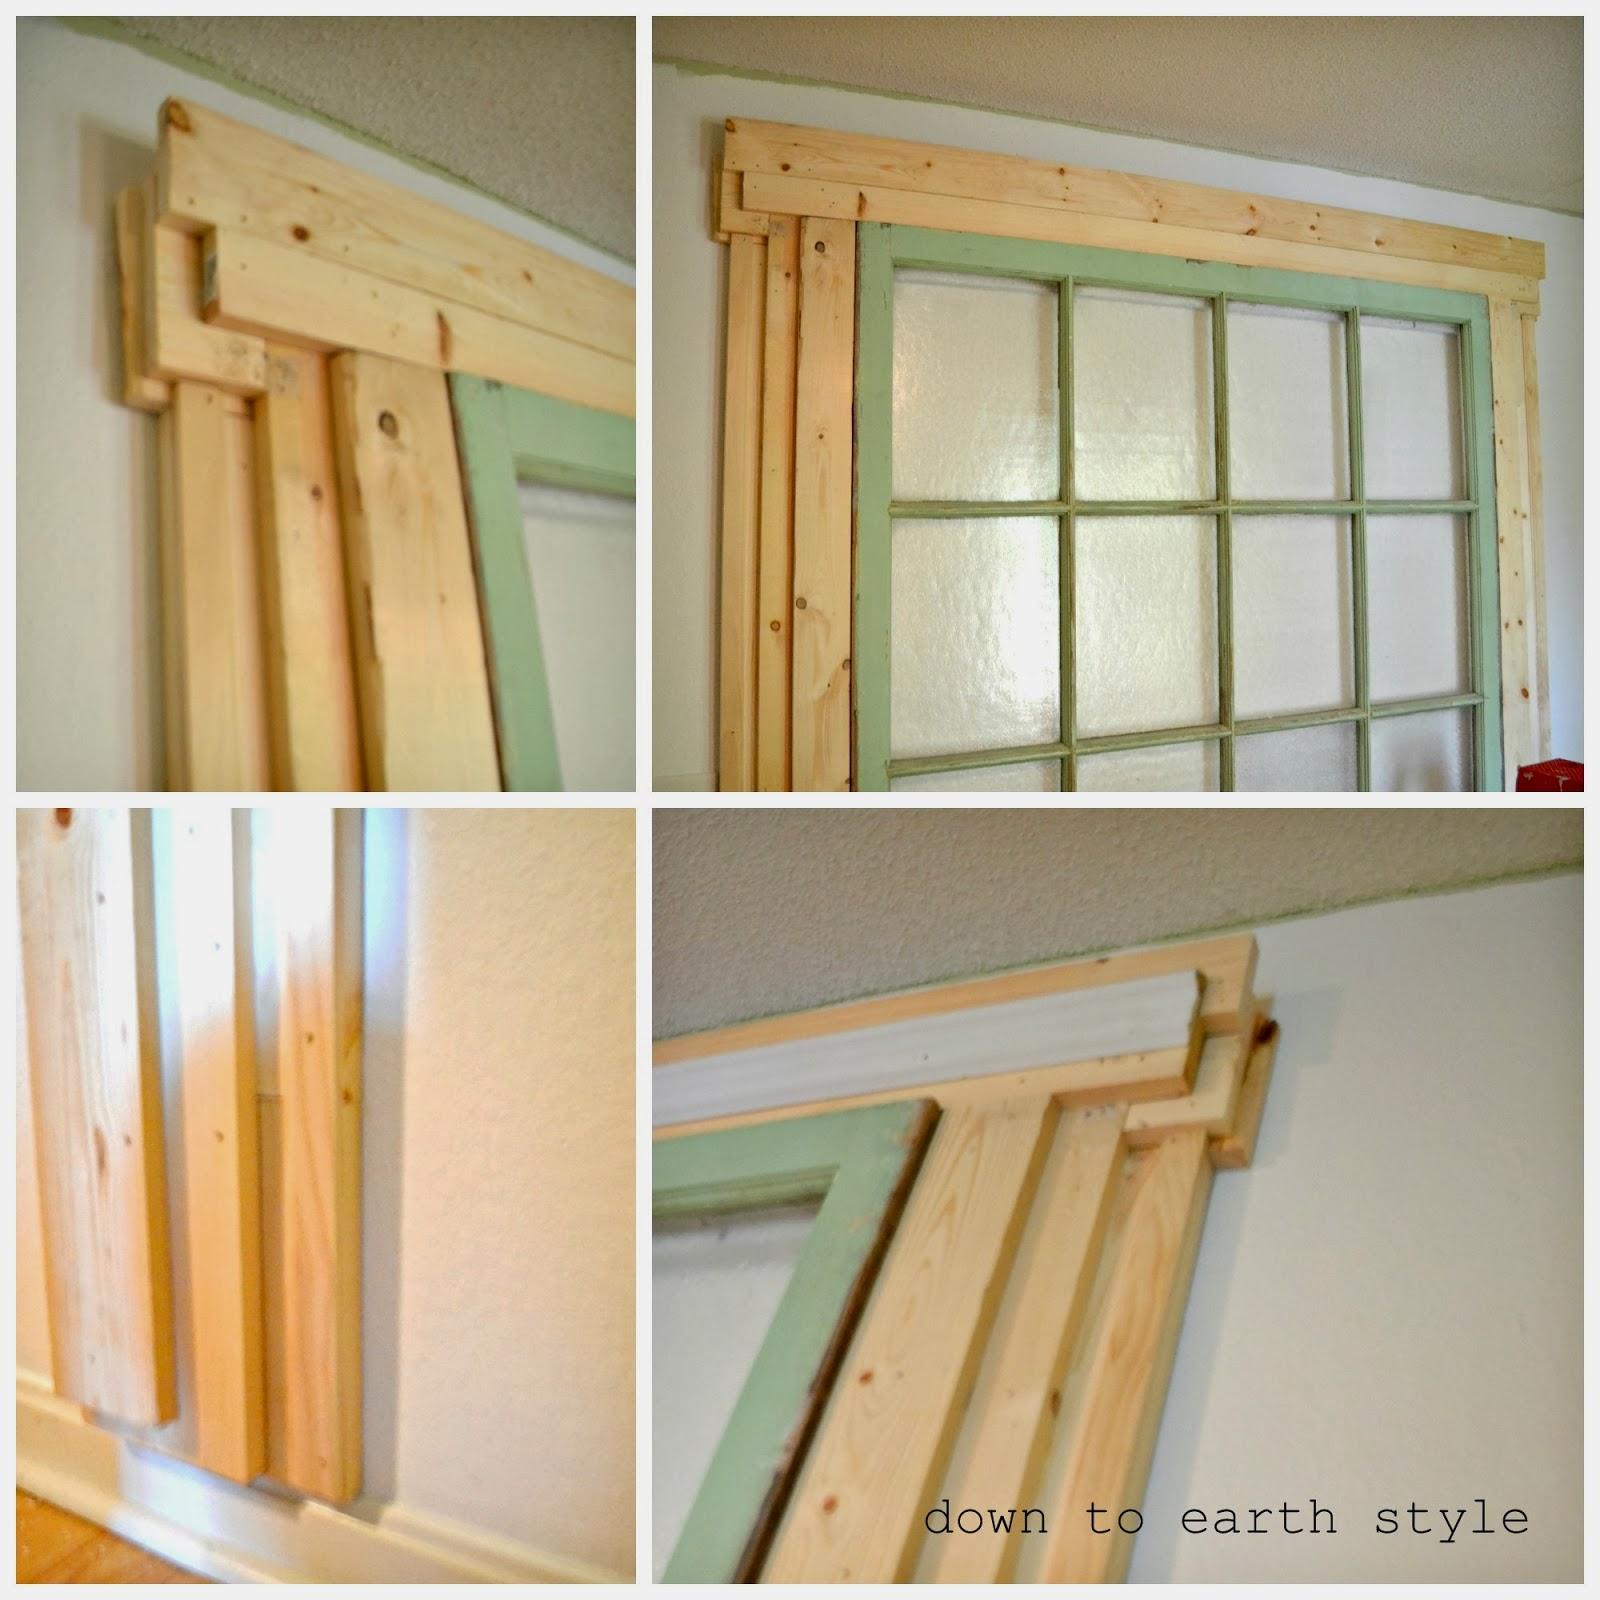 down to earth style old window headboard - Old Window Ideas